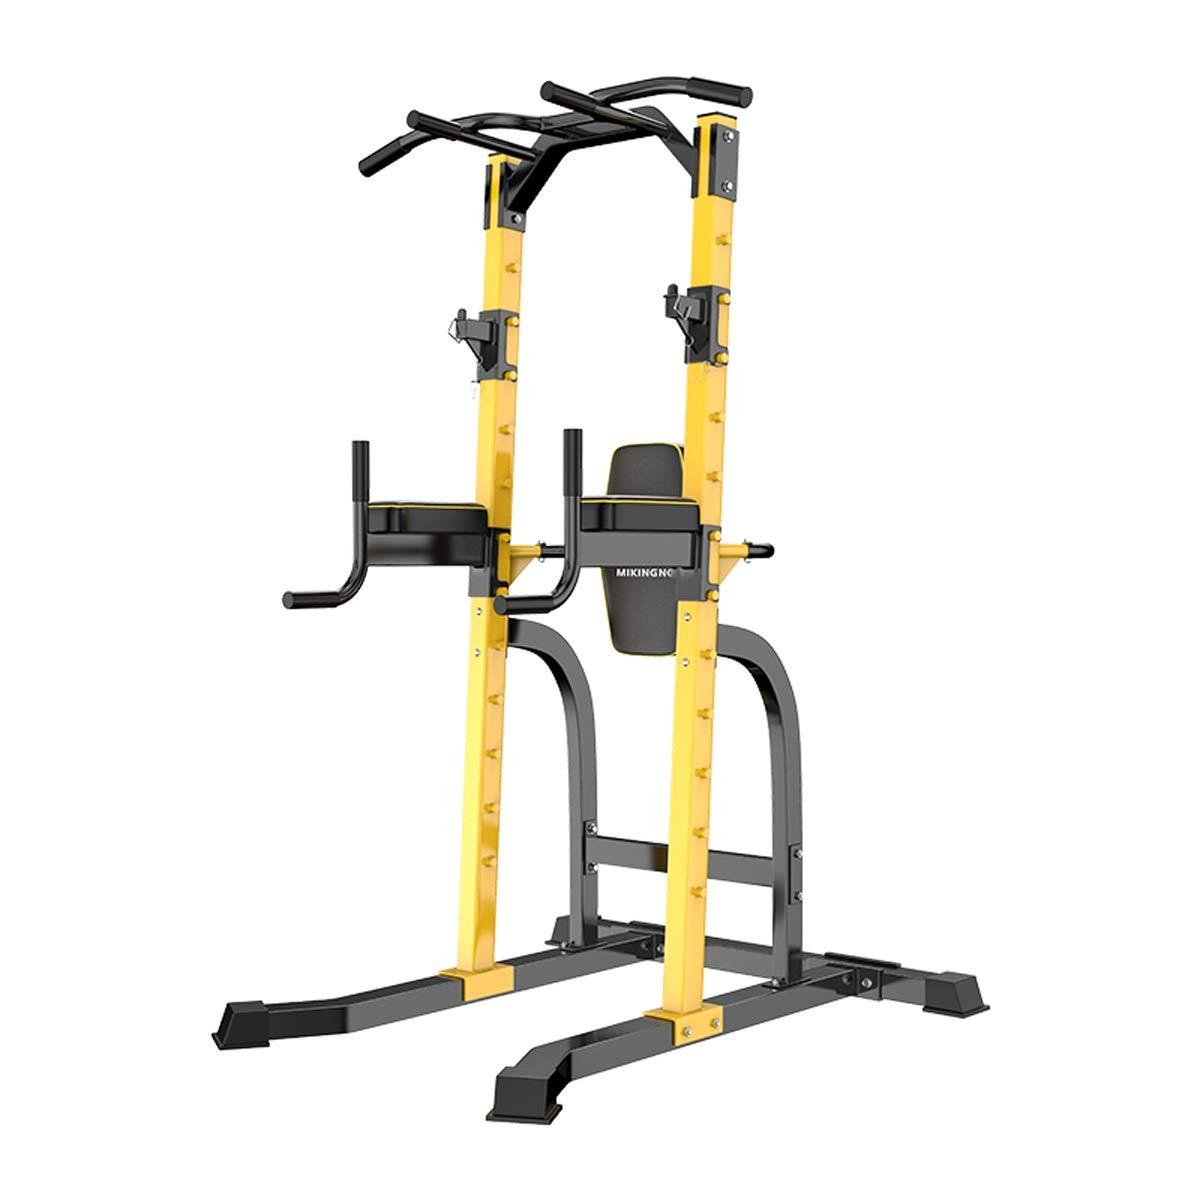 Pull-ups Home Indoor Horizontal Bar Multi-Functional Fitness Equipment Squat Bench Press Barbell Bracket by Baianju